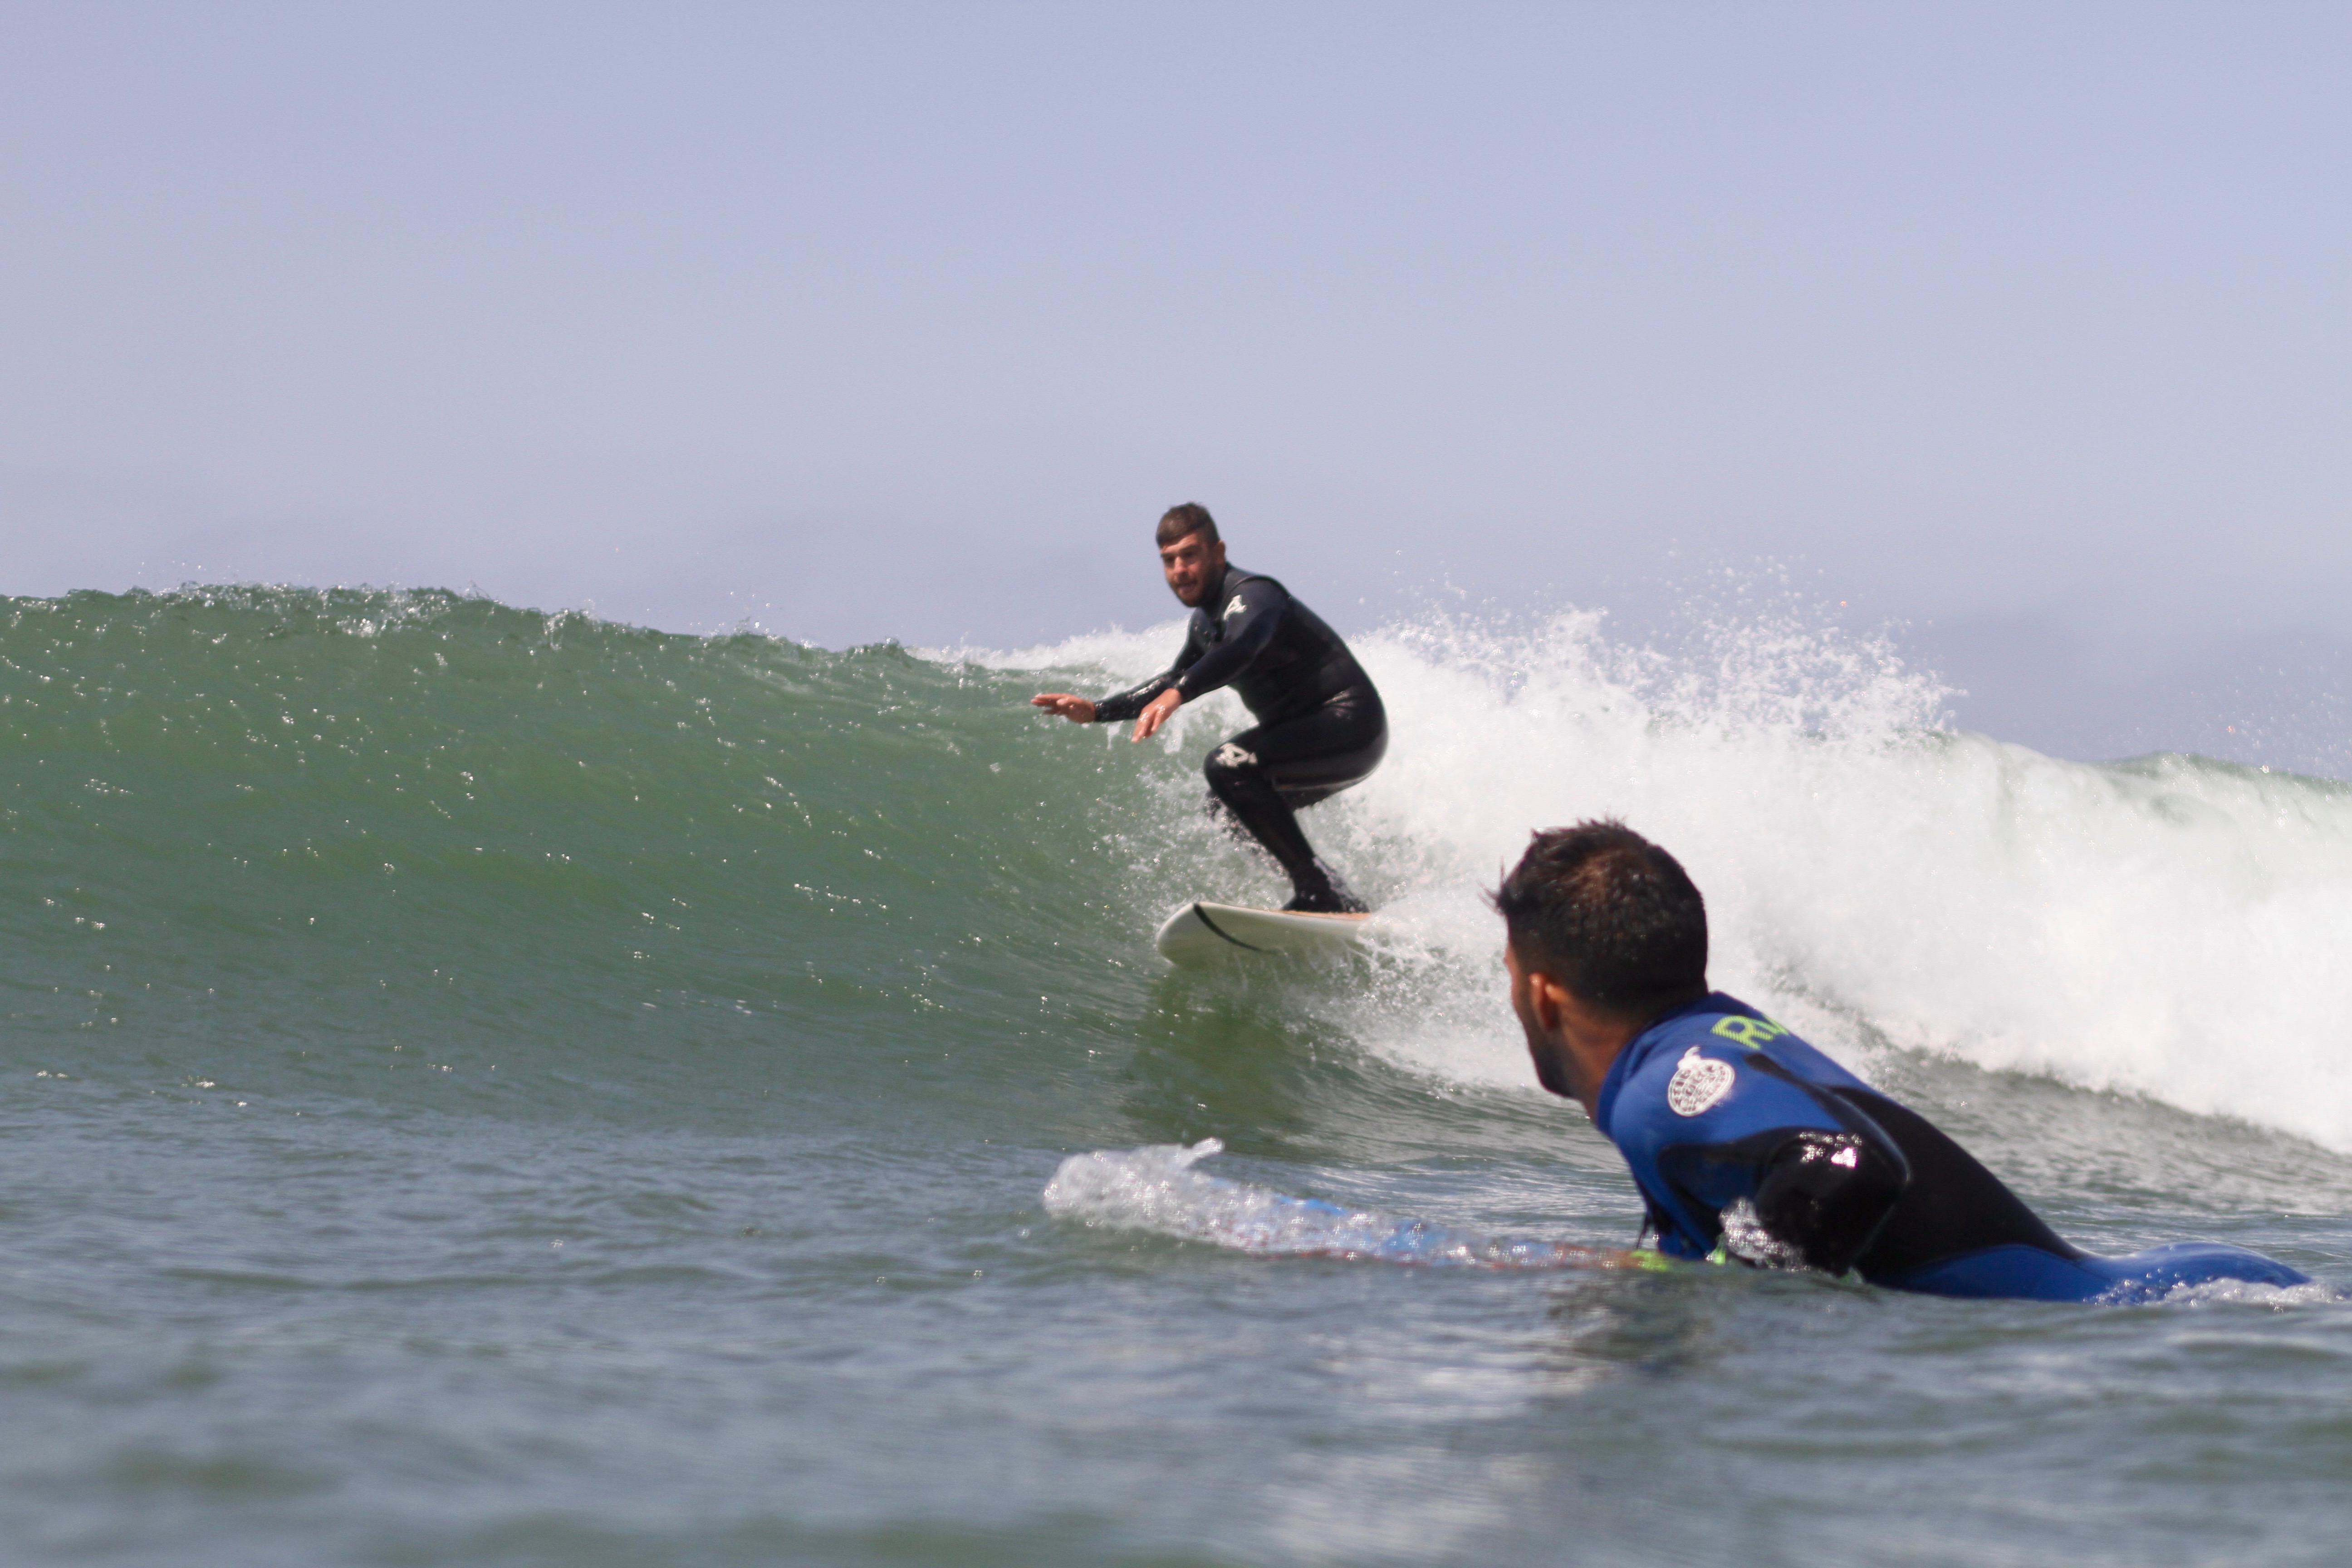 серф и скейт кэмп в Эрисейре